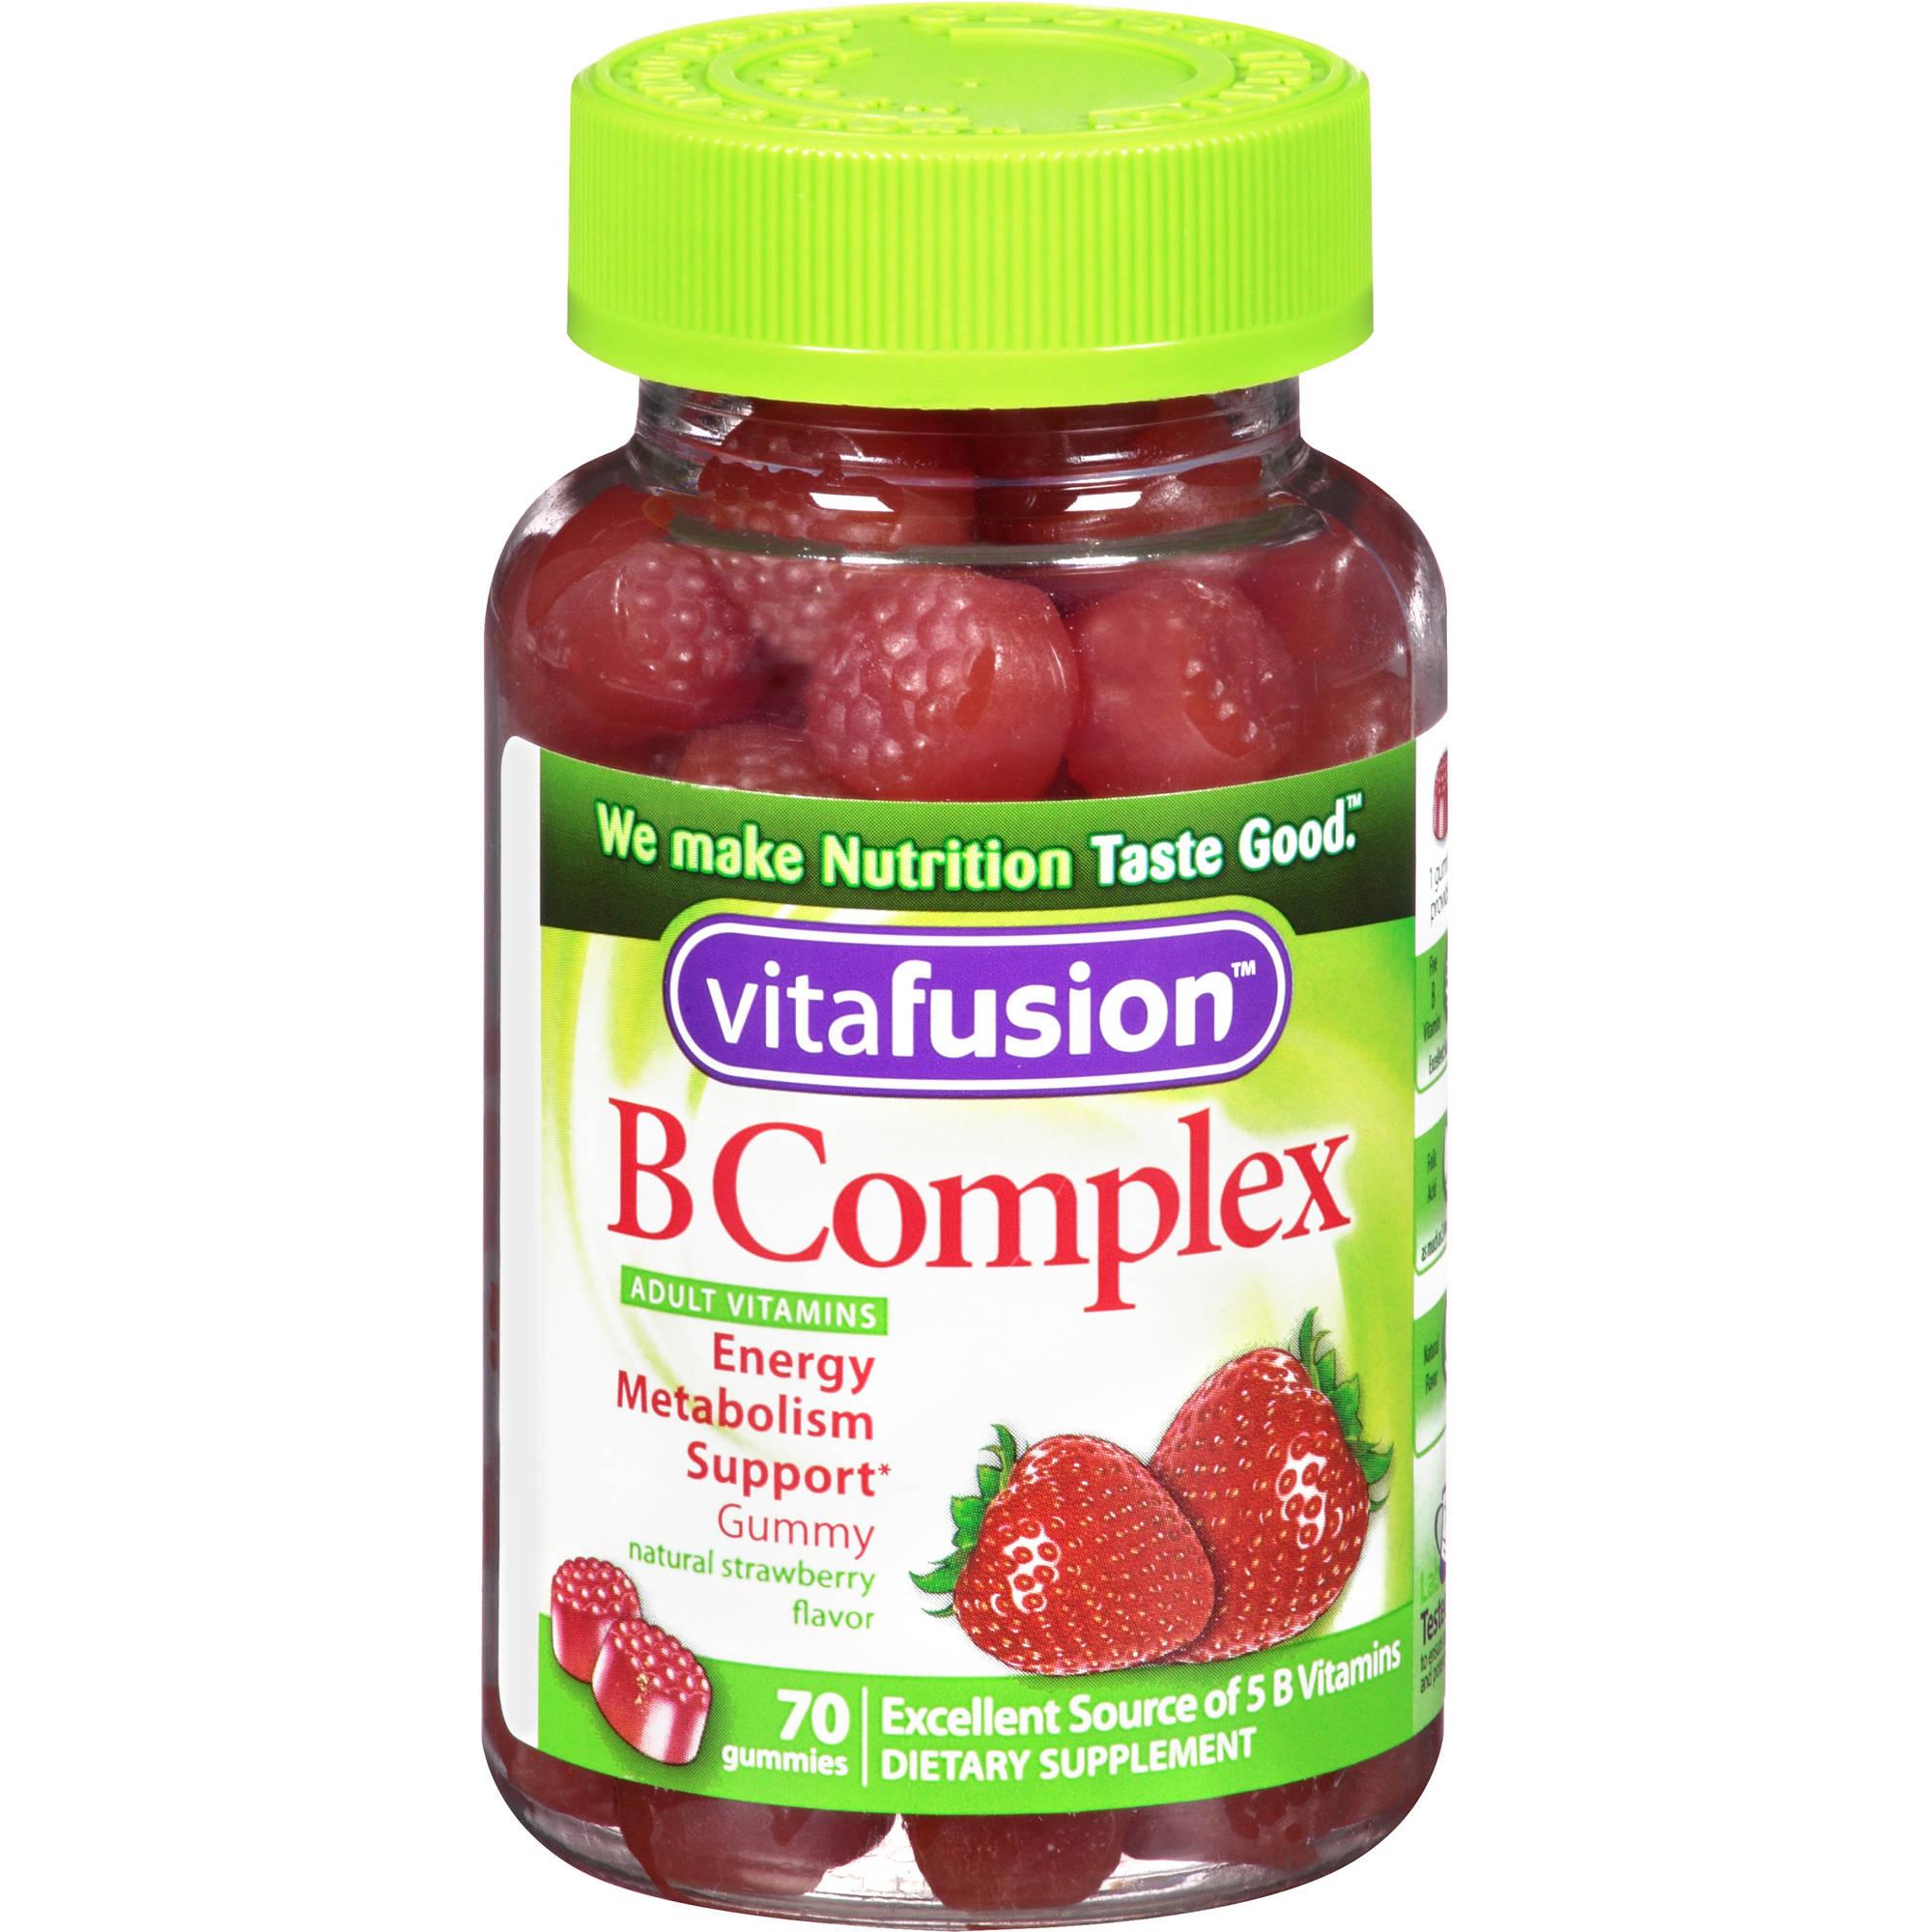 Vitafusion B Complex Gummy Vitamins, 70 count